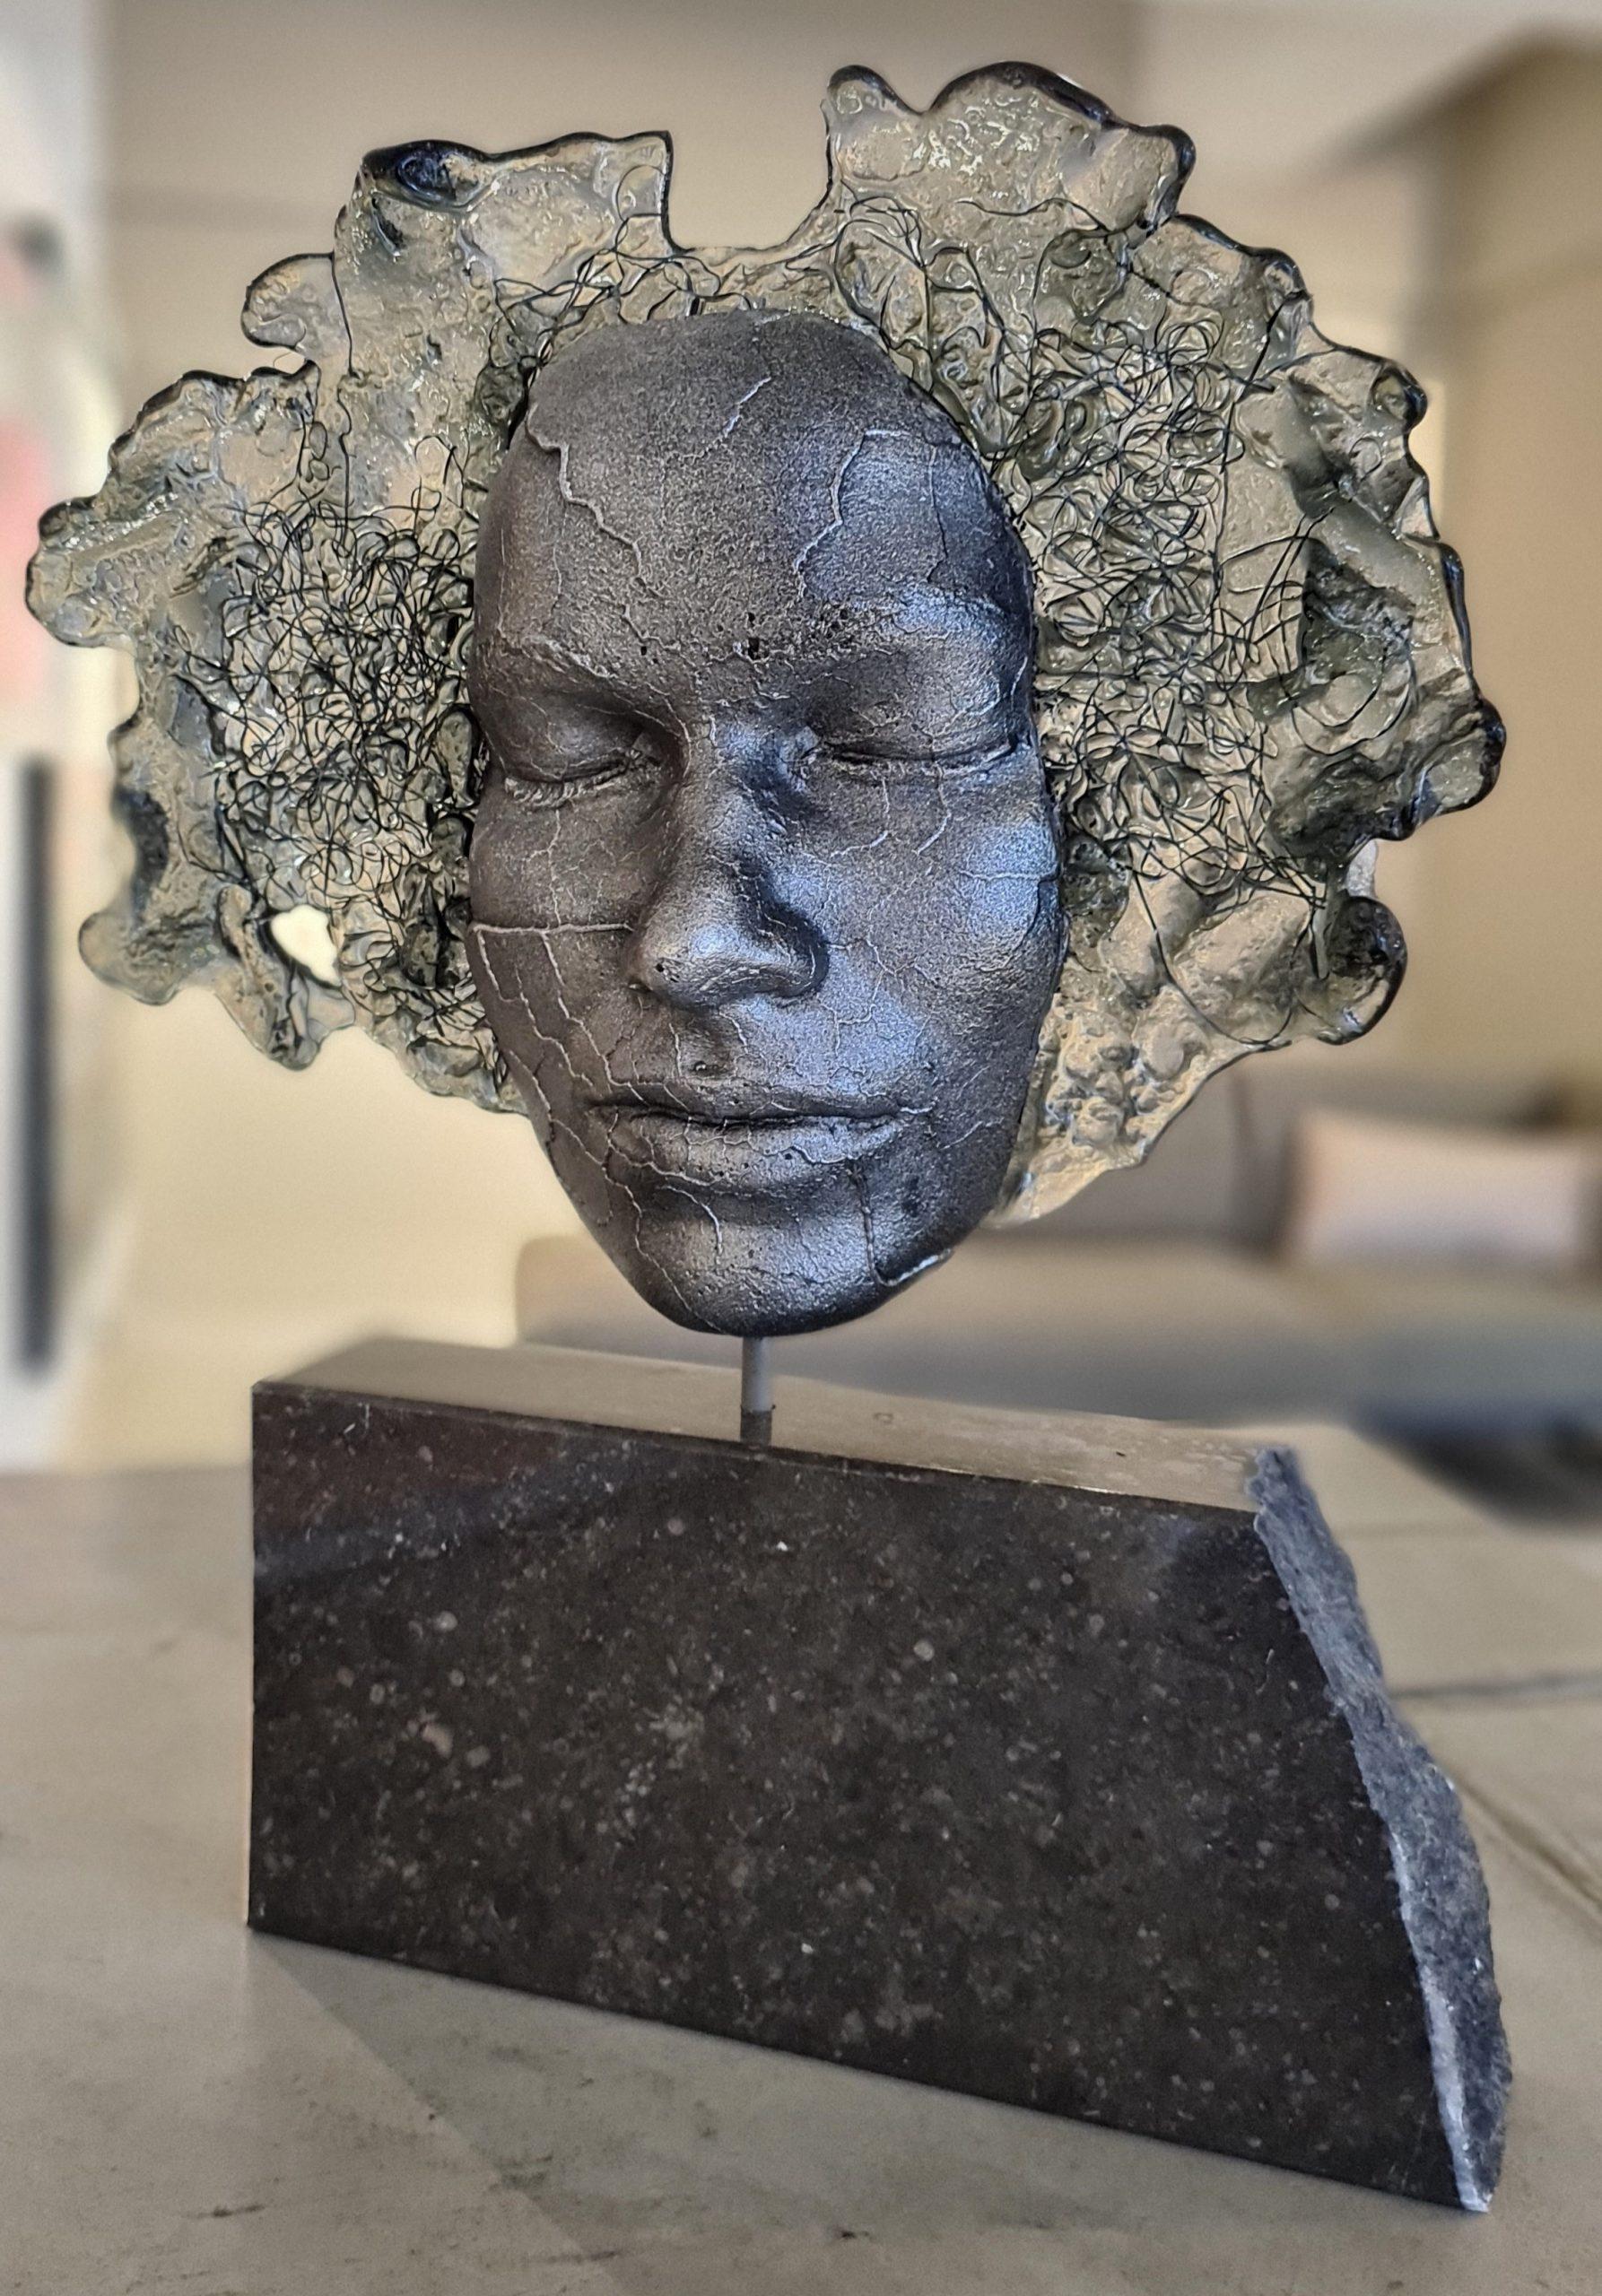 Kunst: Tranformation van kunstenaar Mari Meszaros